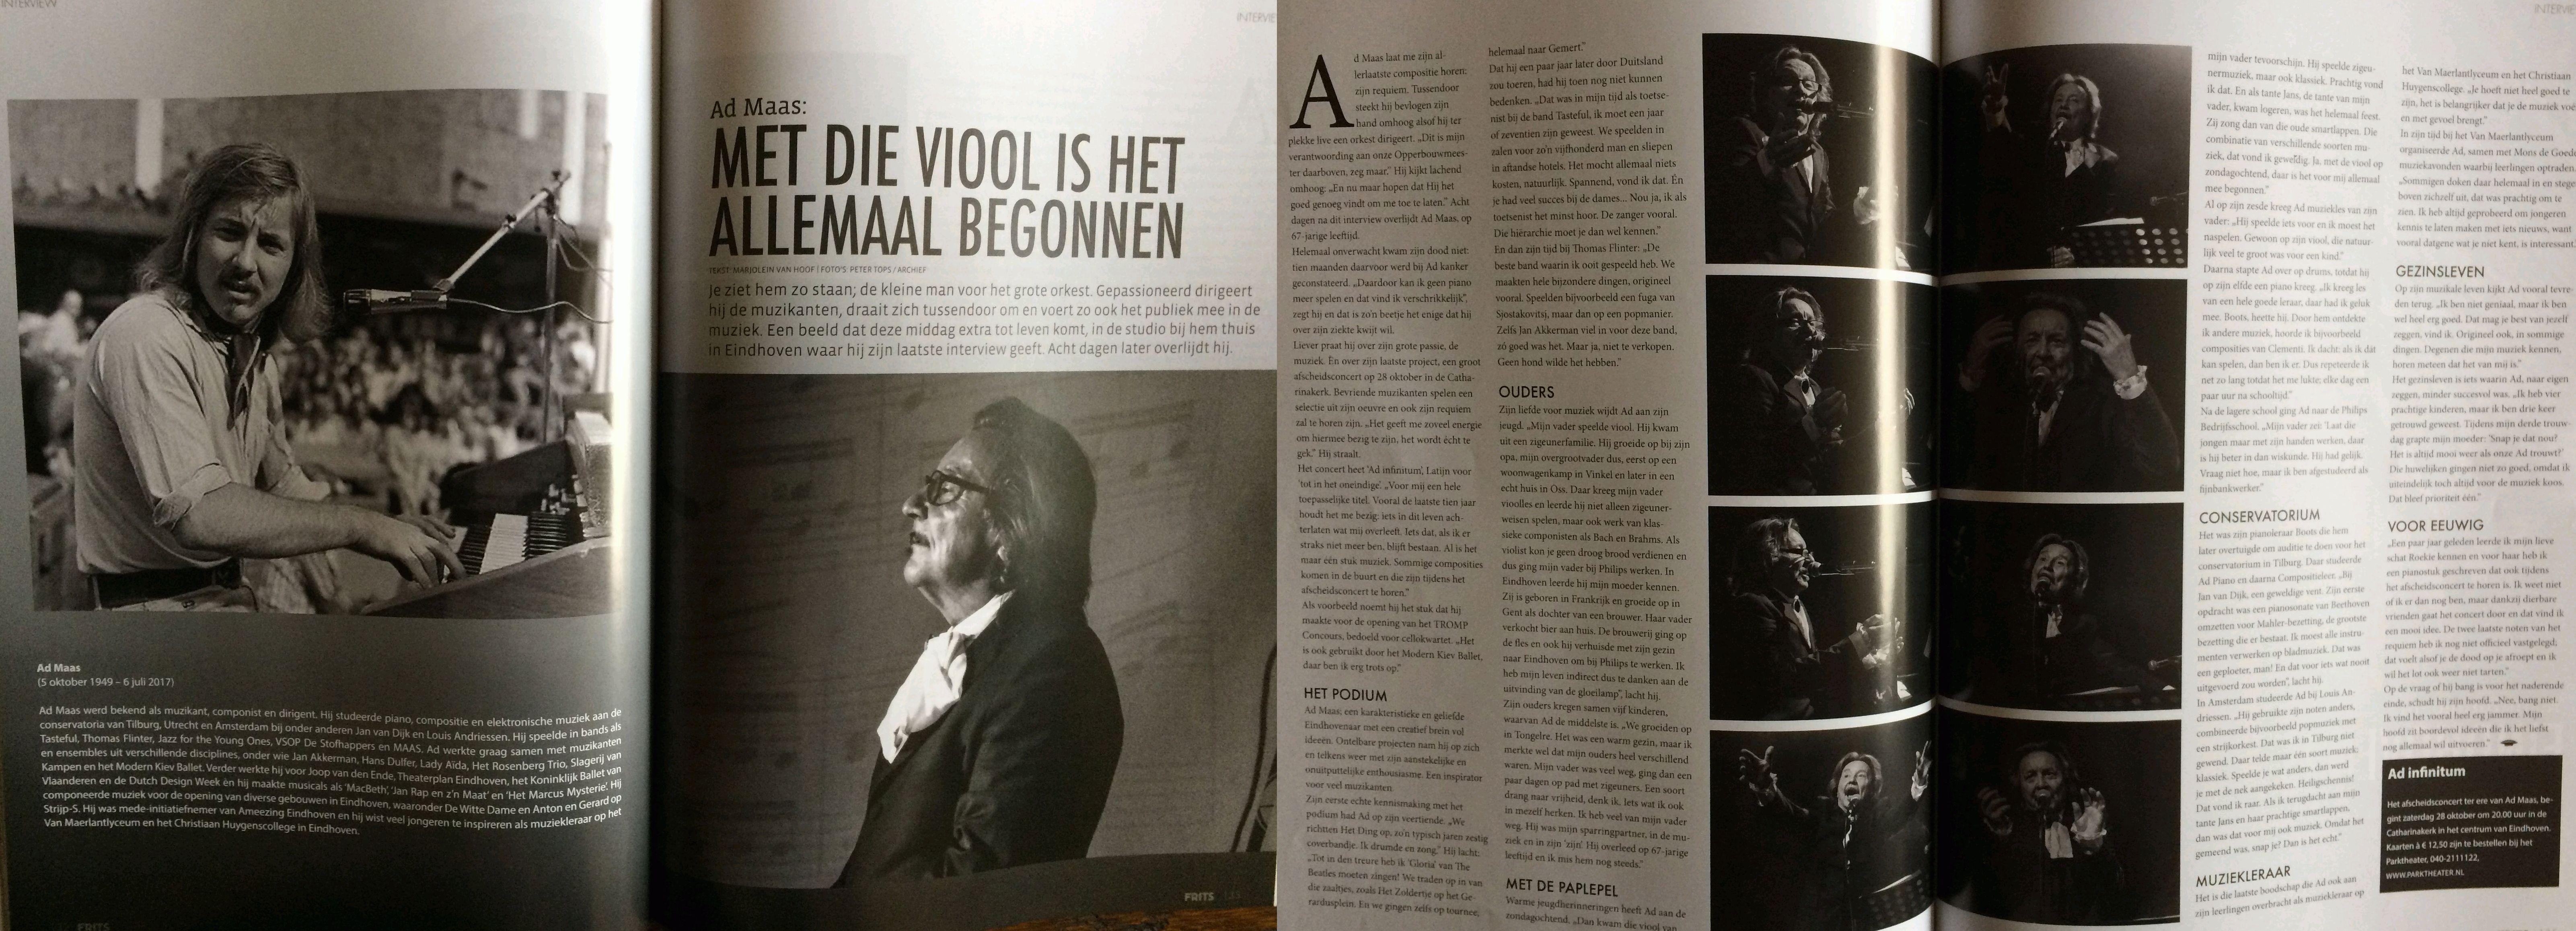 01-artikel-Ad-Maas.jpg